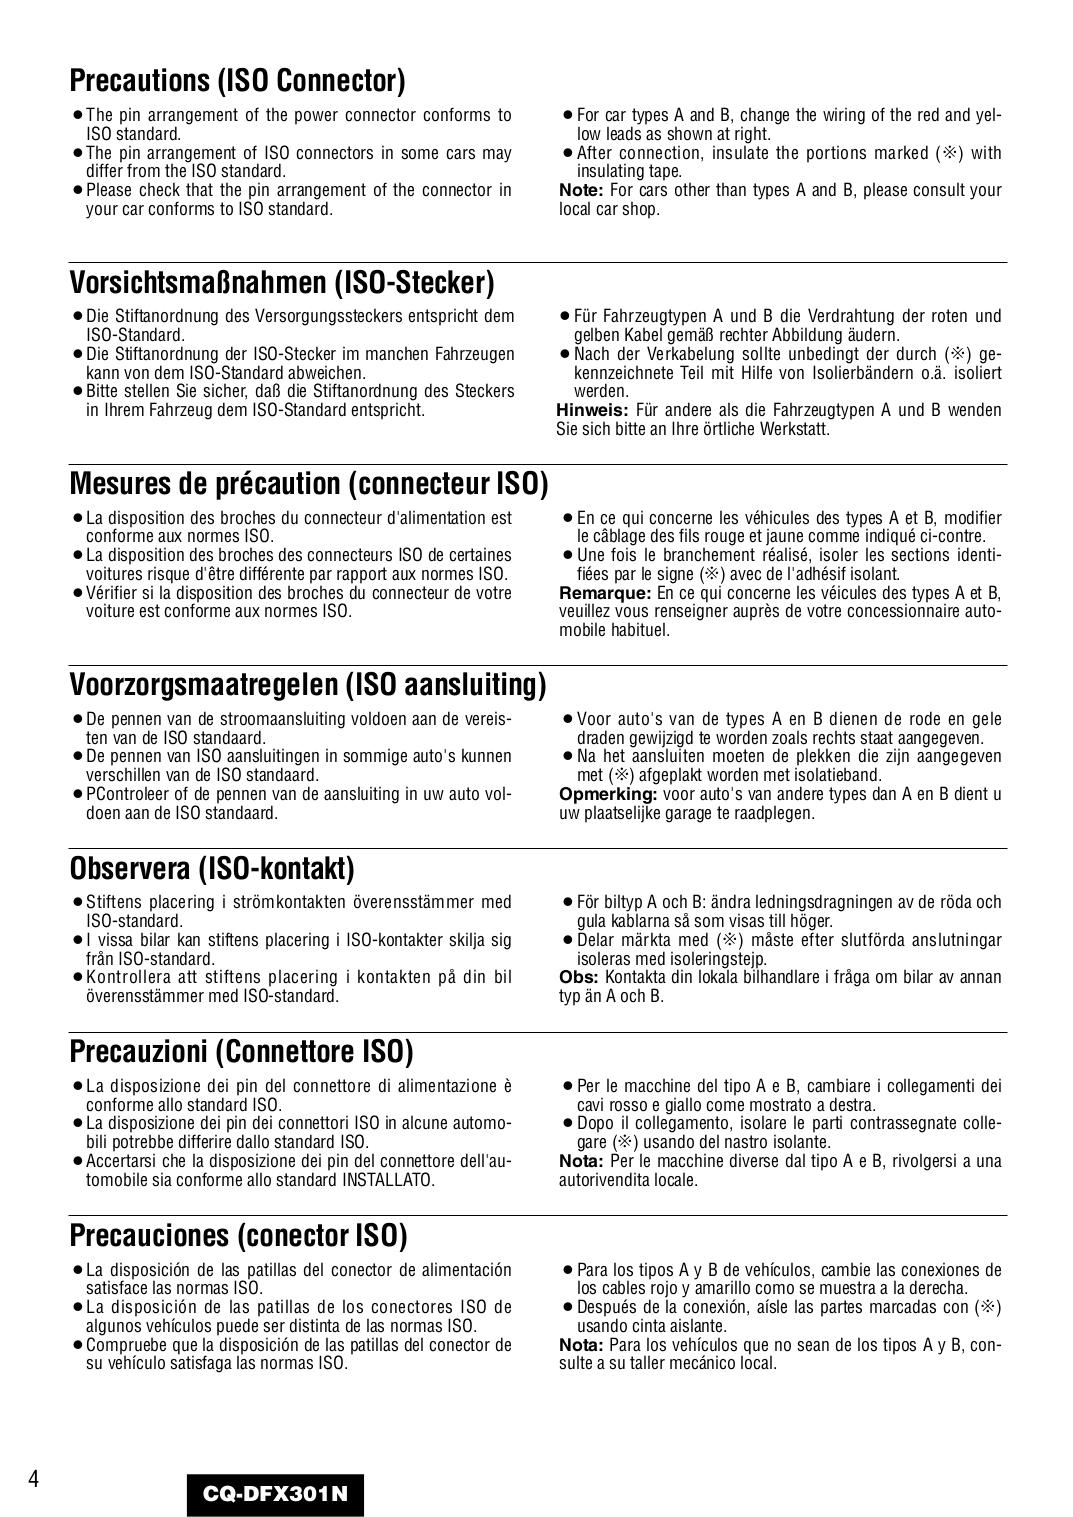 Panasonic Cq Dfx301u Wiring Diagram And Schematics Dak Pdf Manual For Car Receiver Source Page Preview